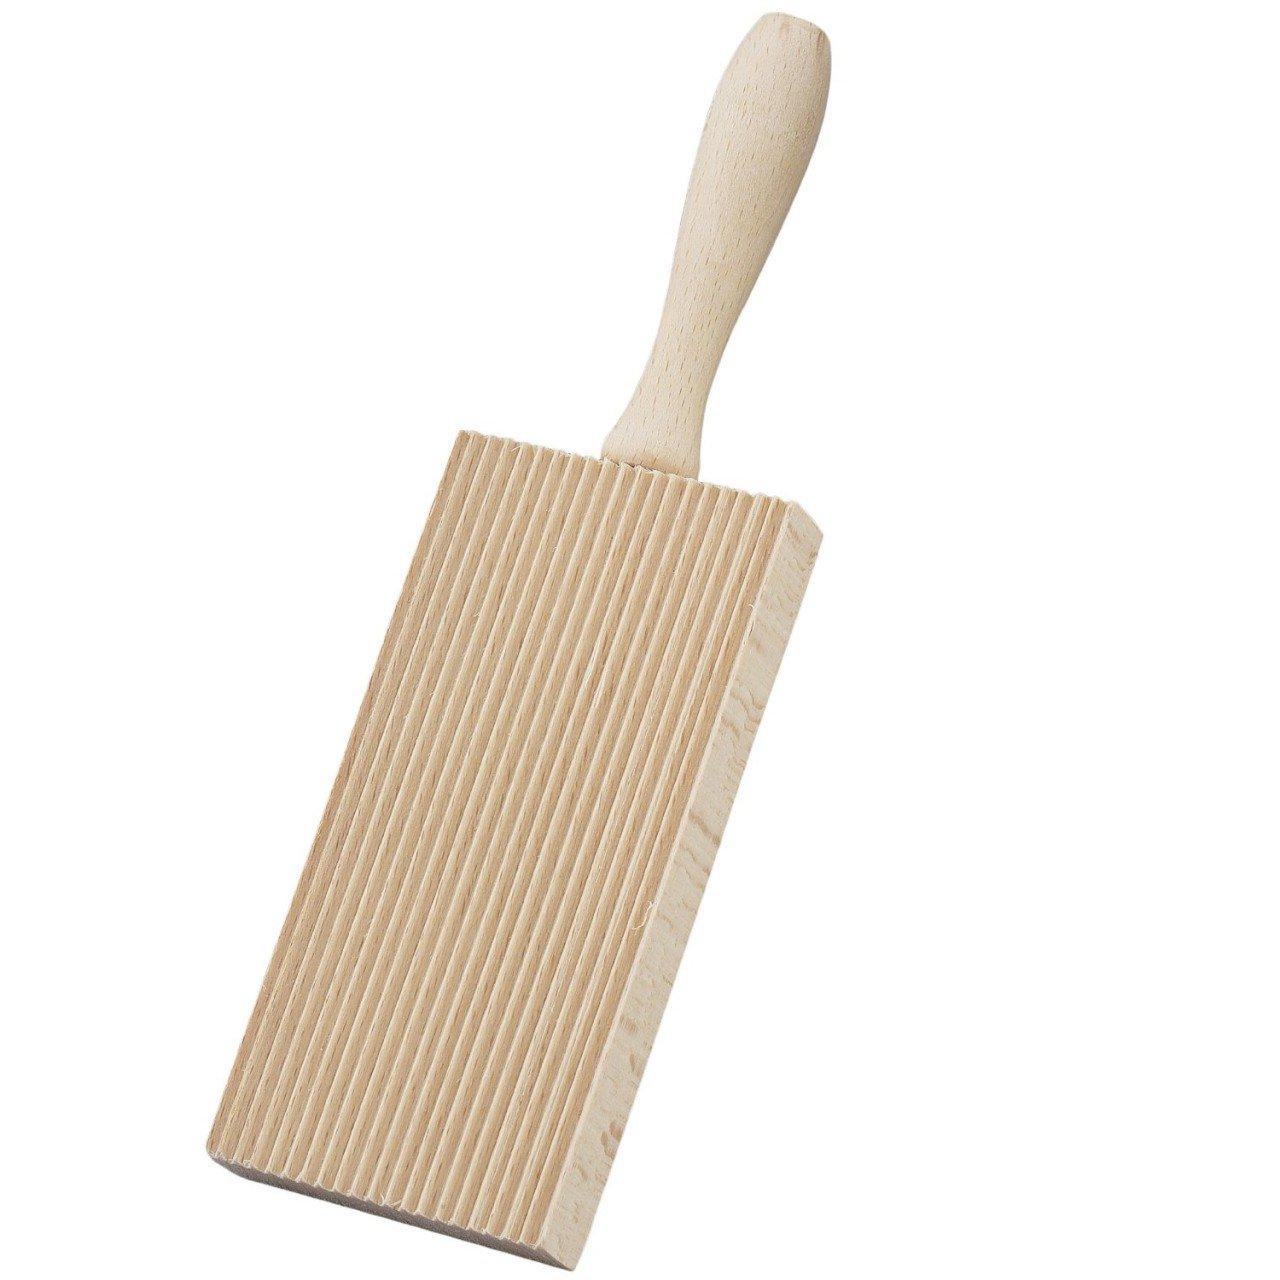 Cuisinox Gnocchi and Cavatelli Board, Wood Cuisinox (Import) GNO-21